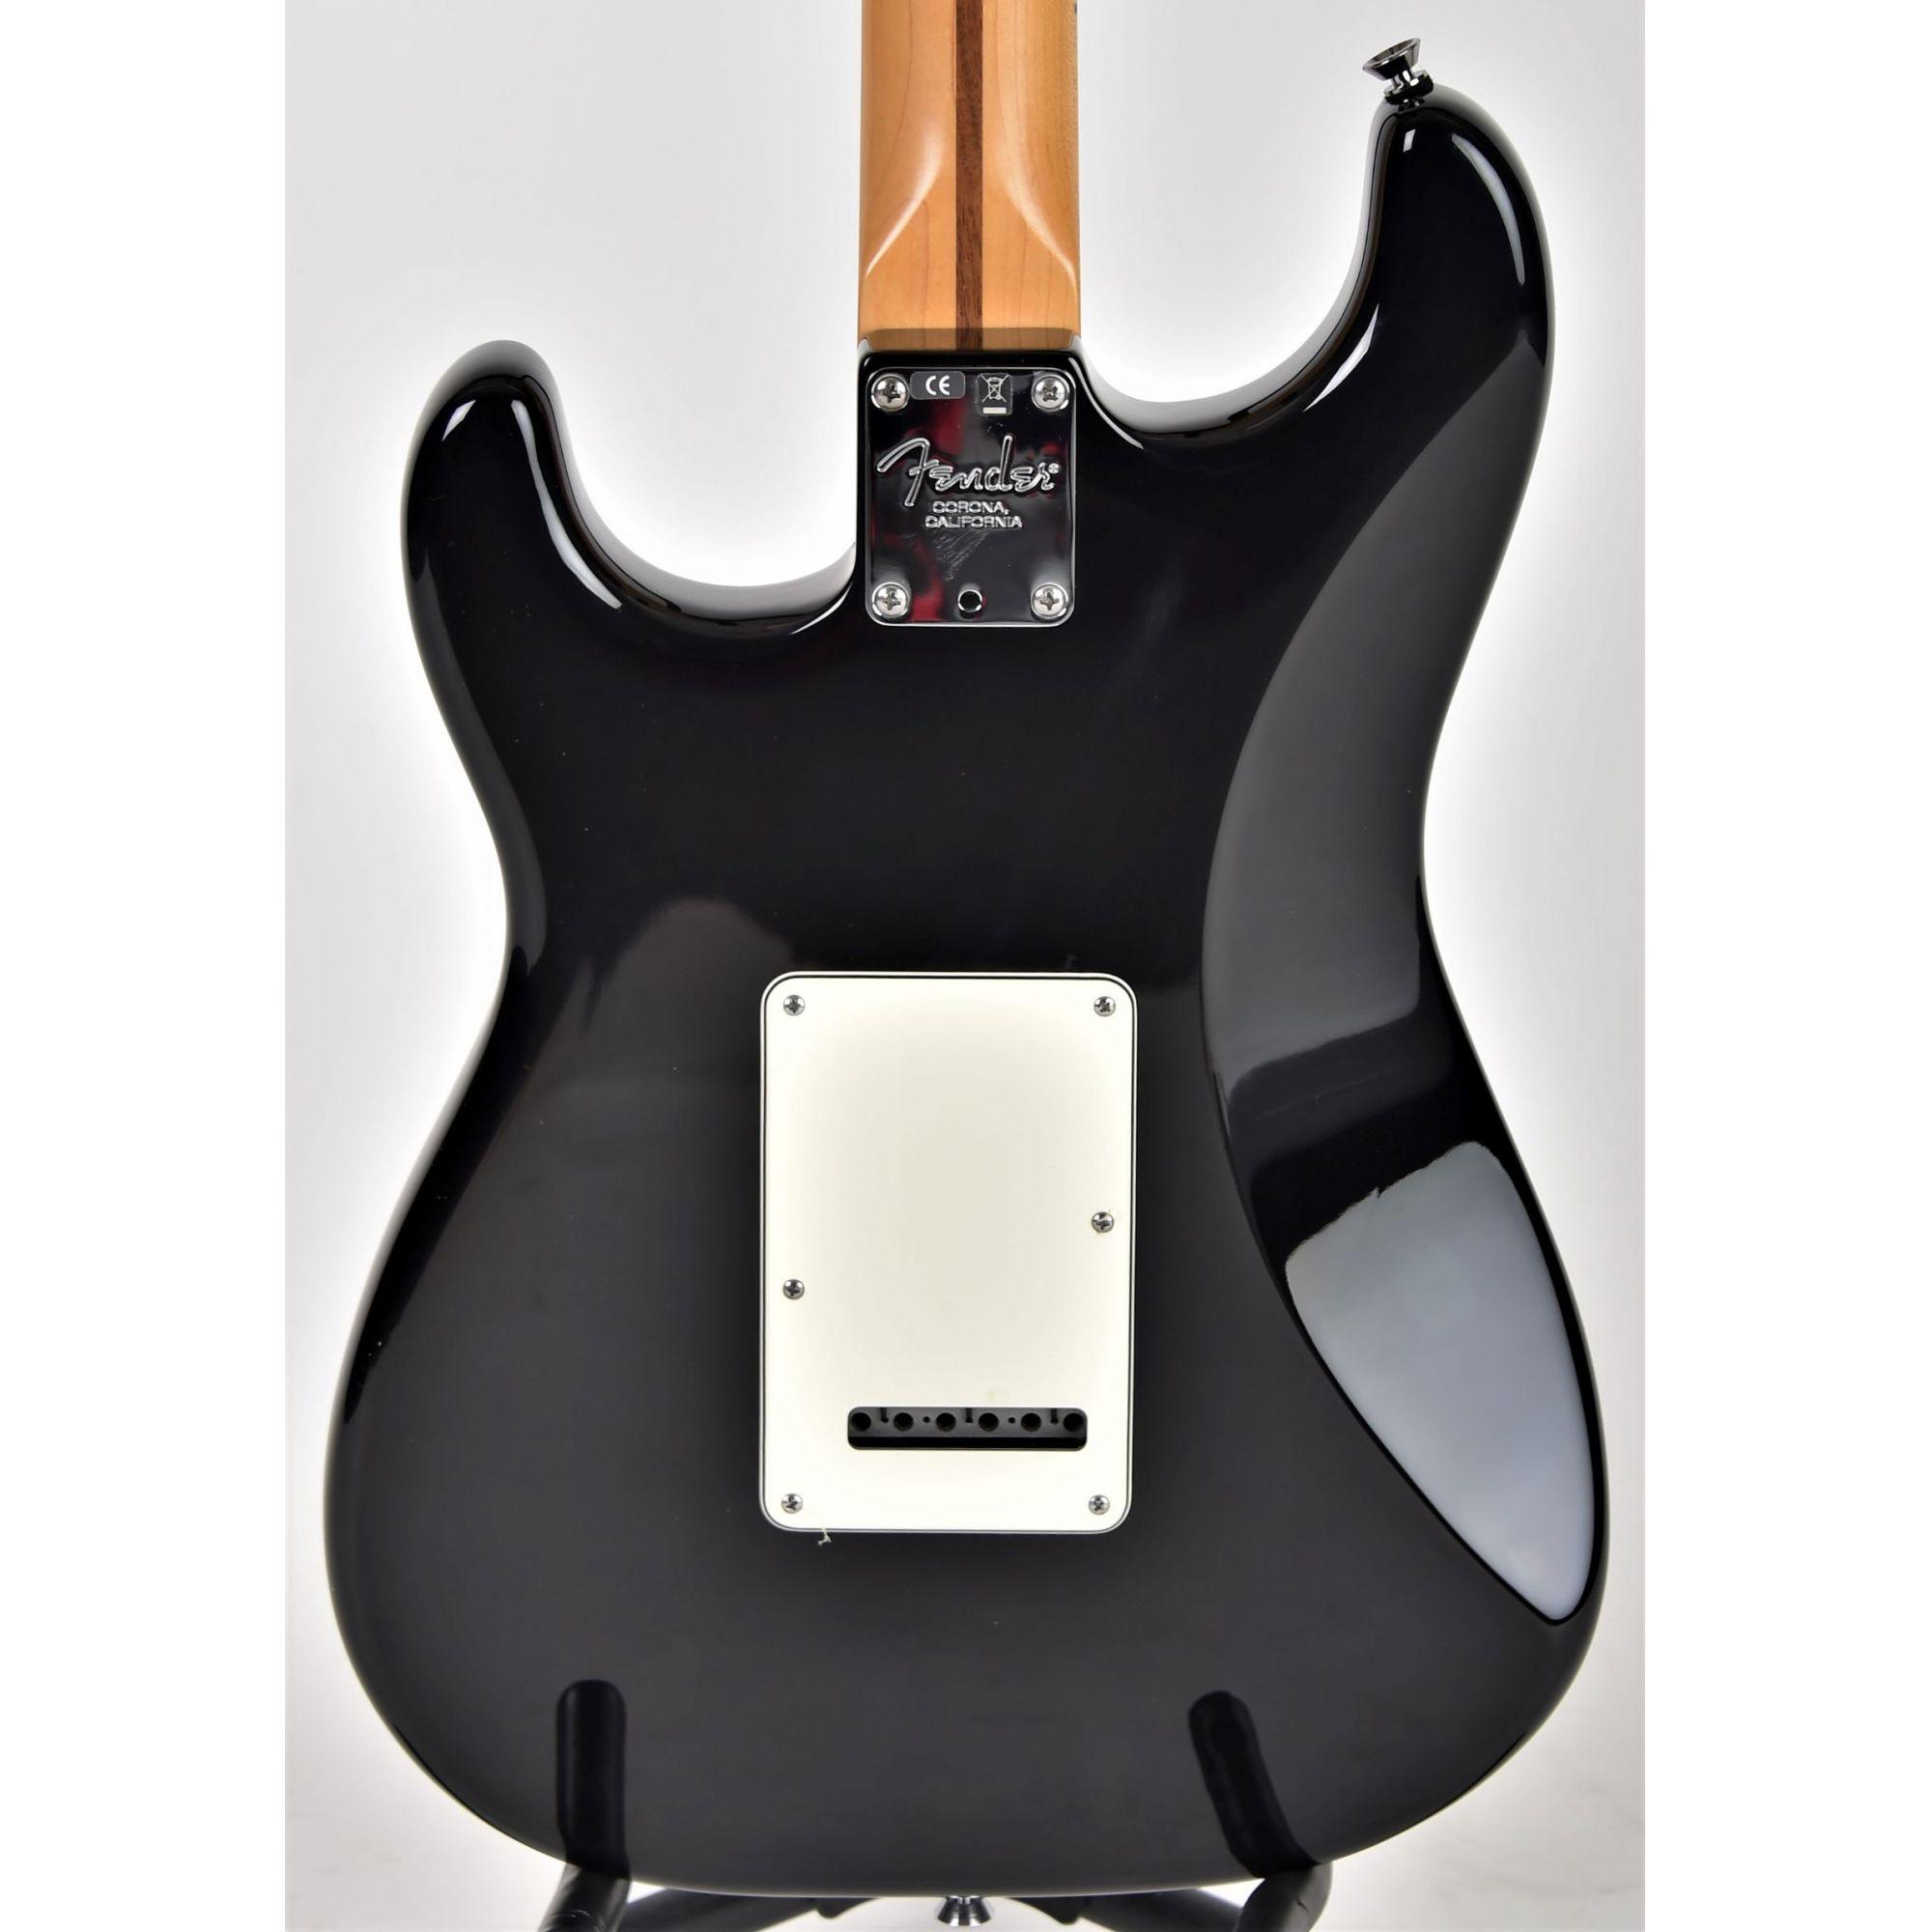 Guitarra Fender American Standard Stratocaster